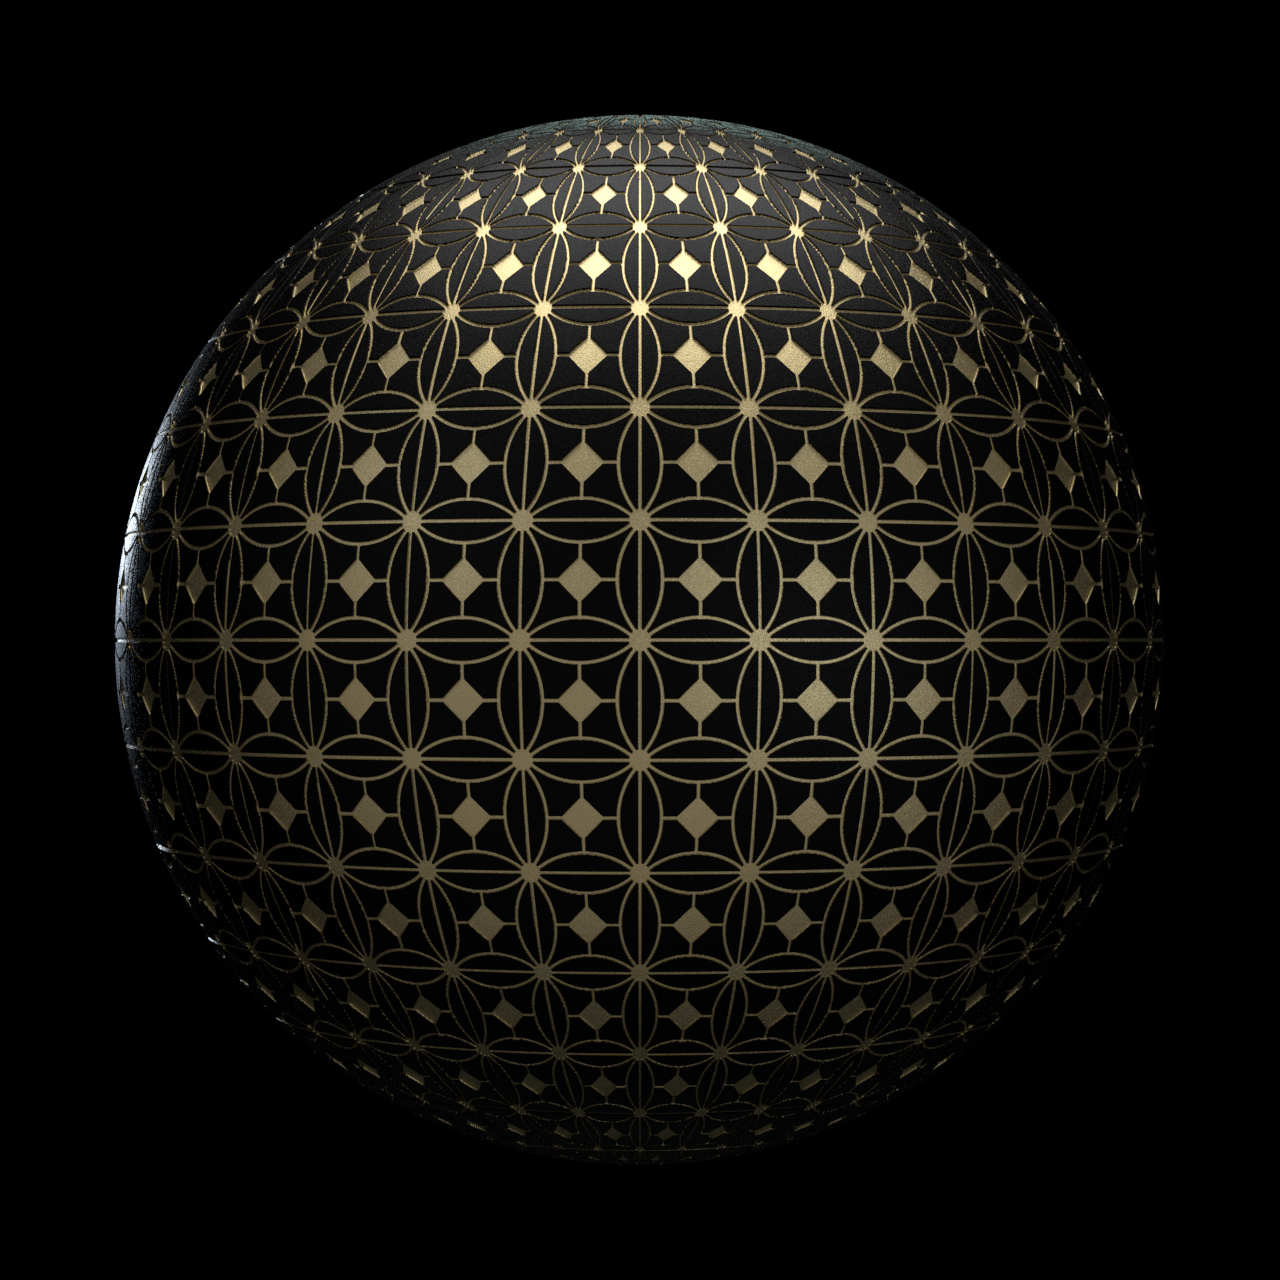 byc_geometric_pack_05_v01.jpg